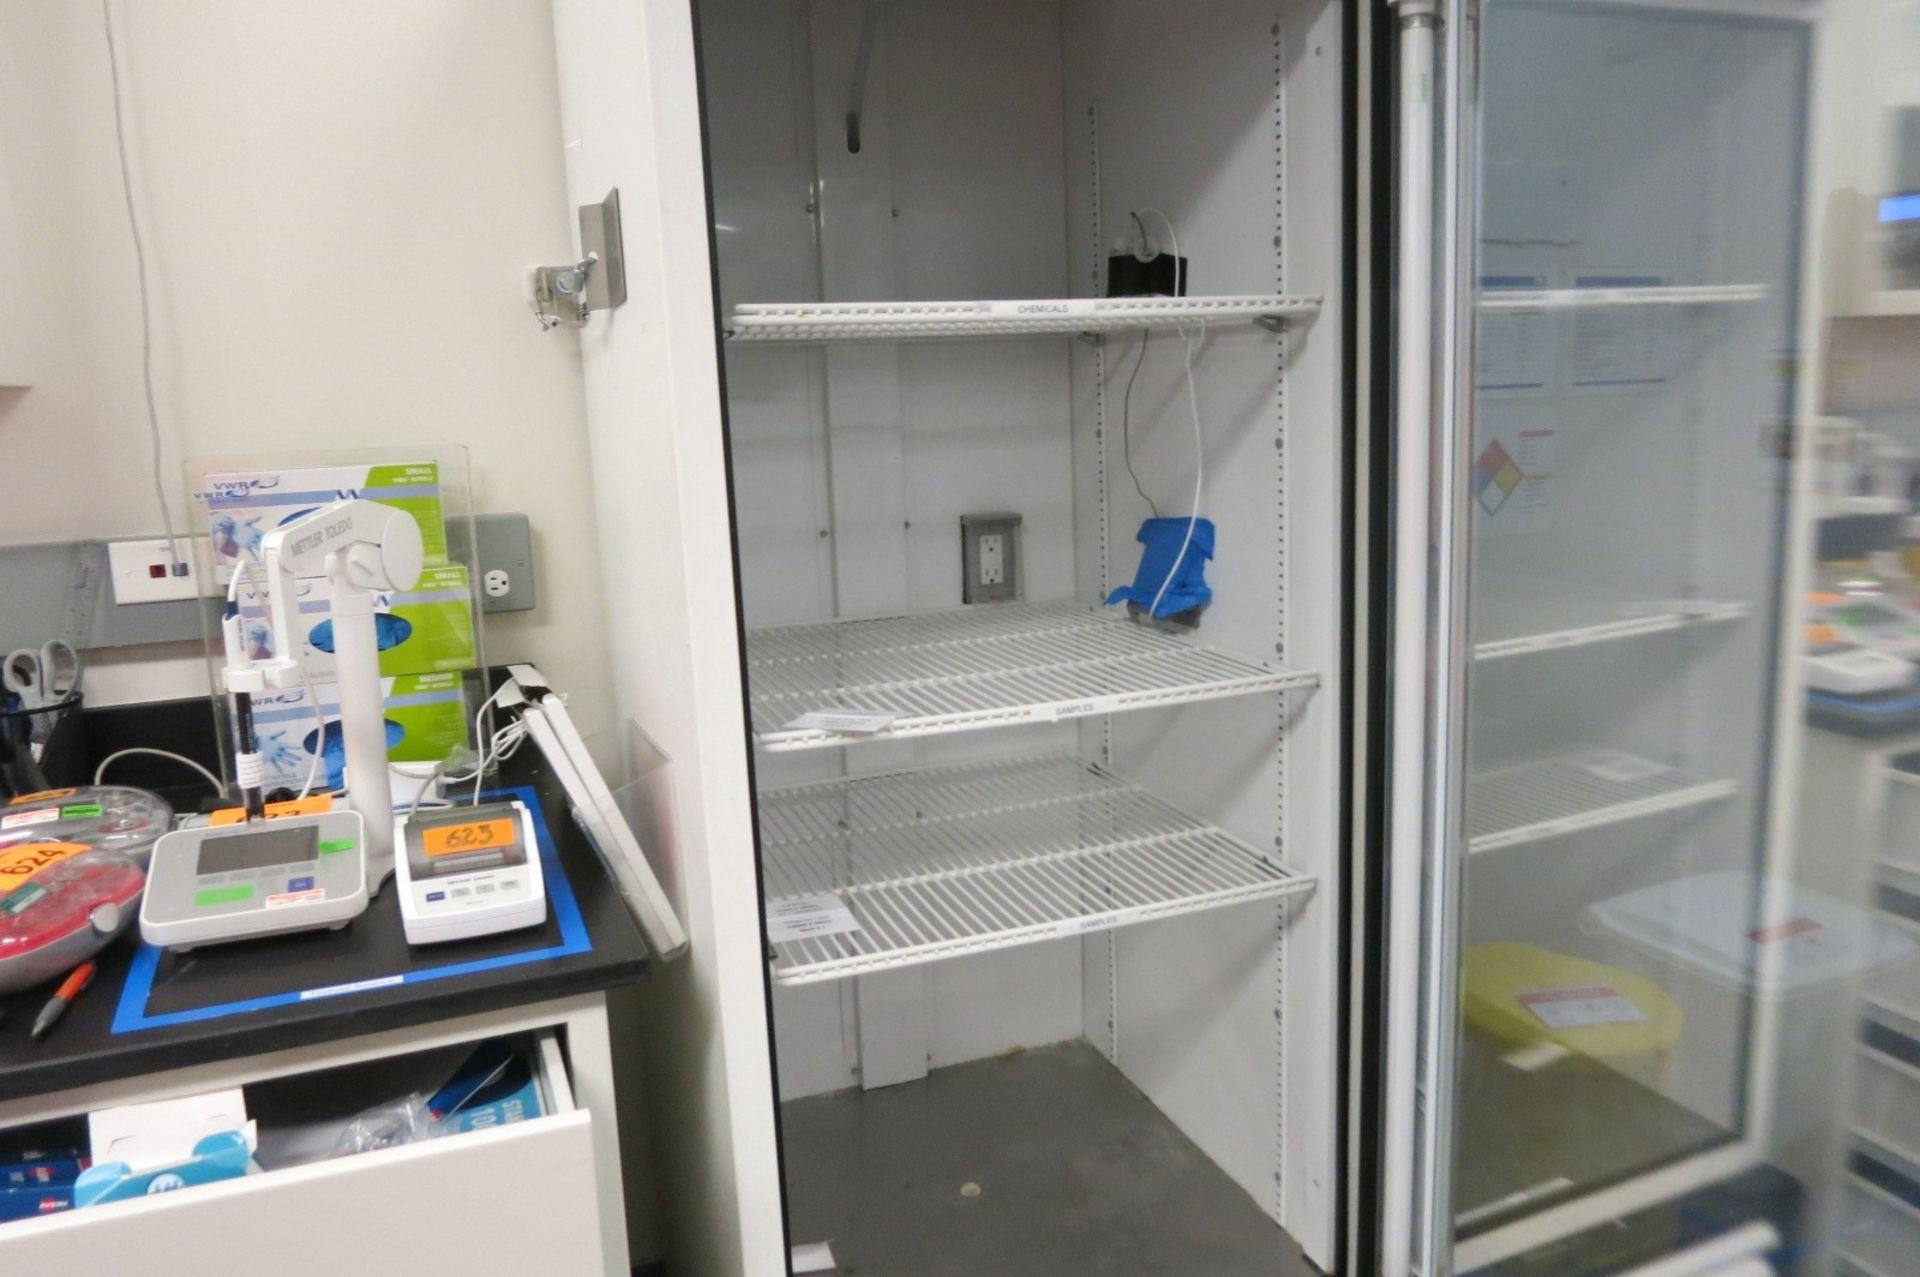 Laboratory Refrigerator - Image 2 of 3